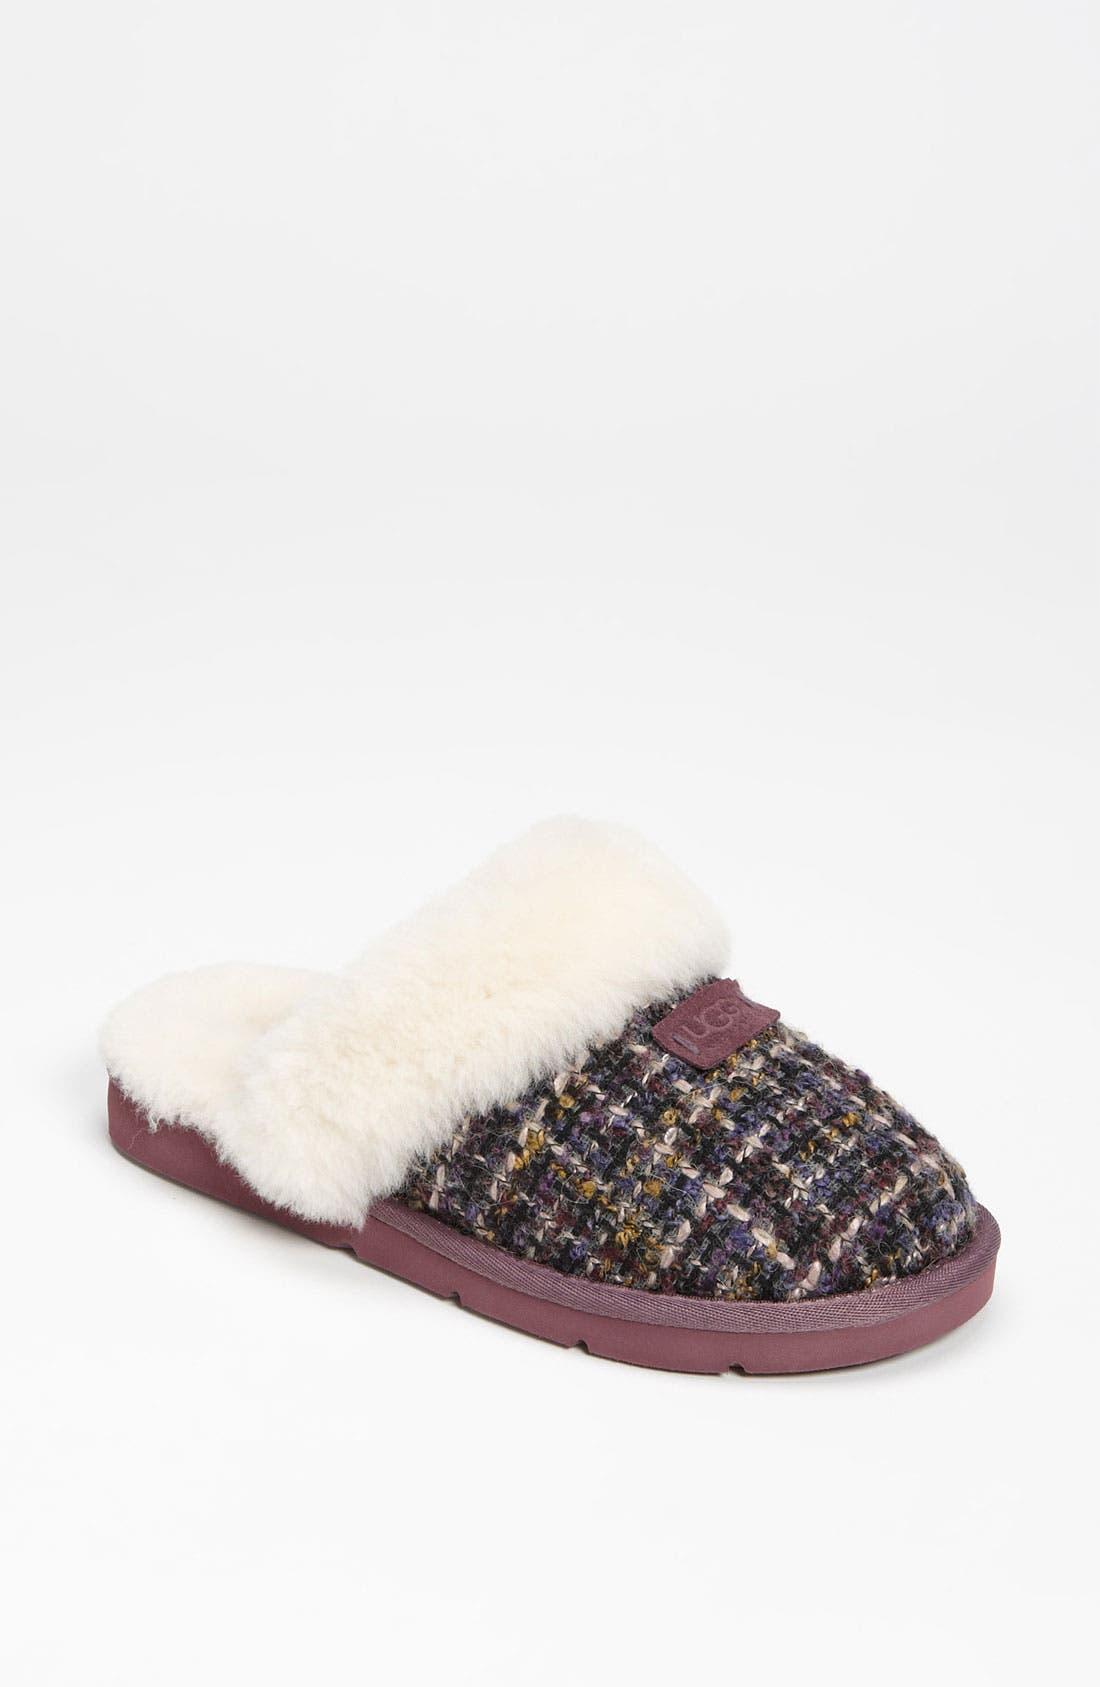 Alternate Image 1 Selected - UGG® Australia 'Cozy Tweed' Slipper (Women)